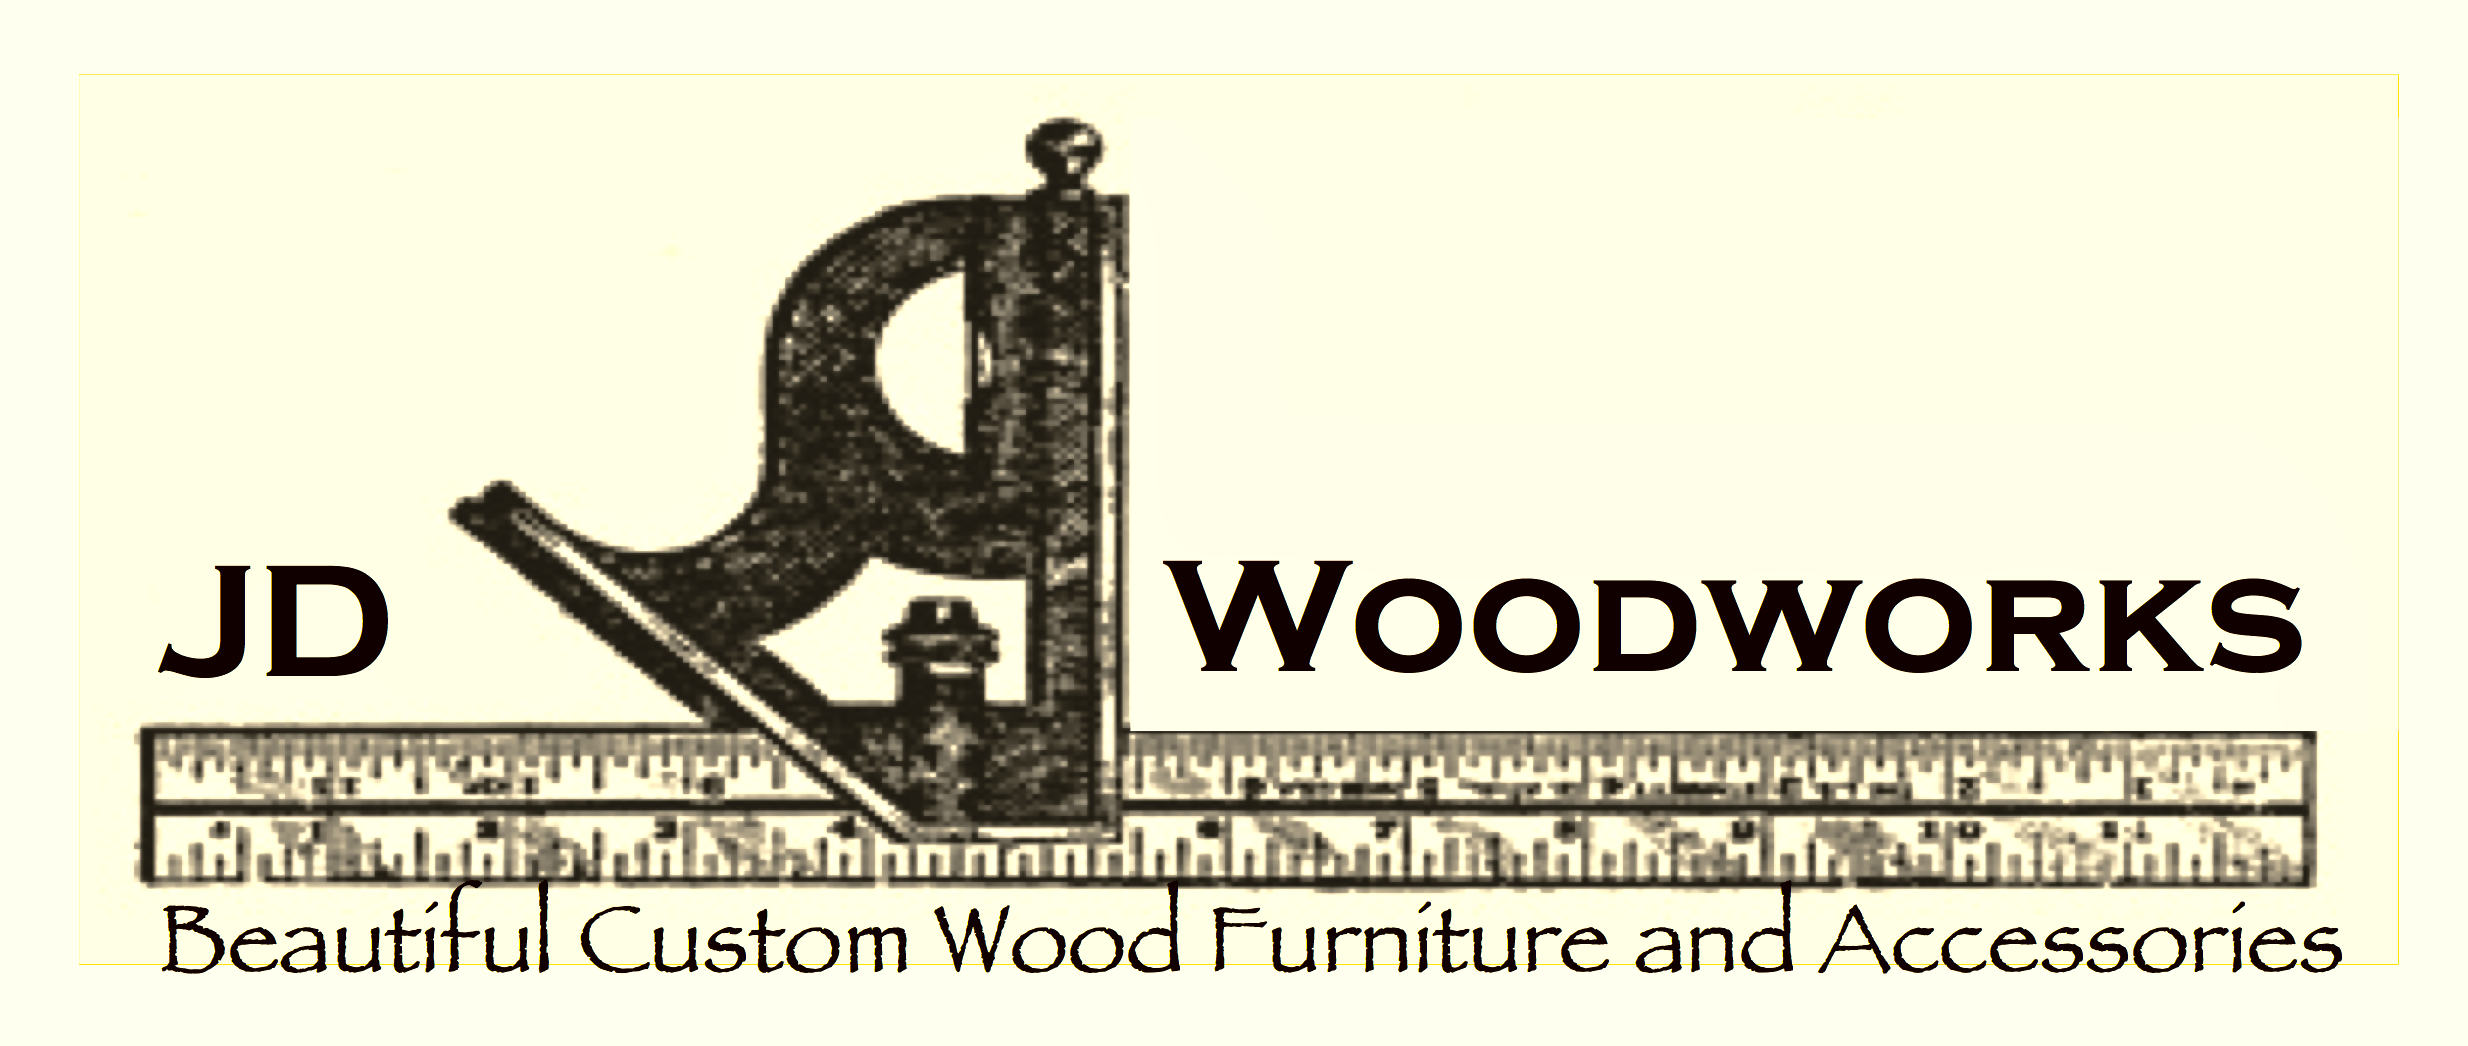 jd custom woodworking